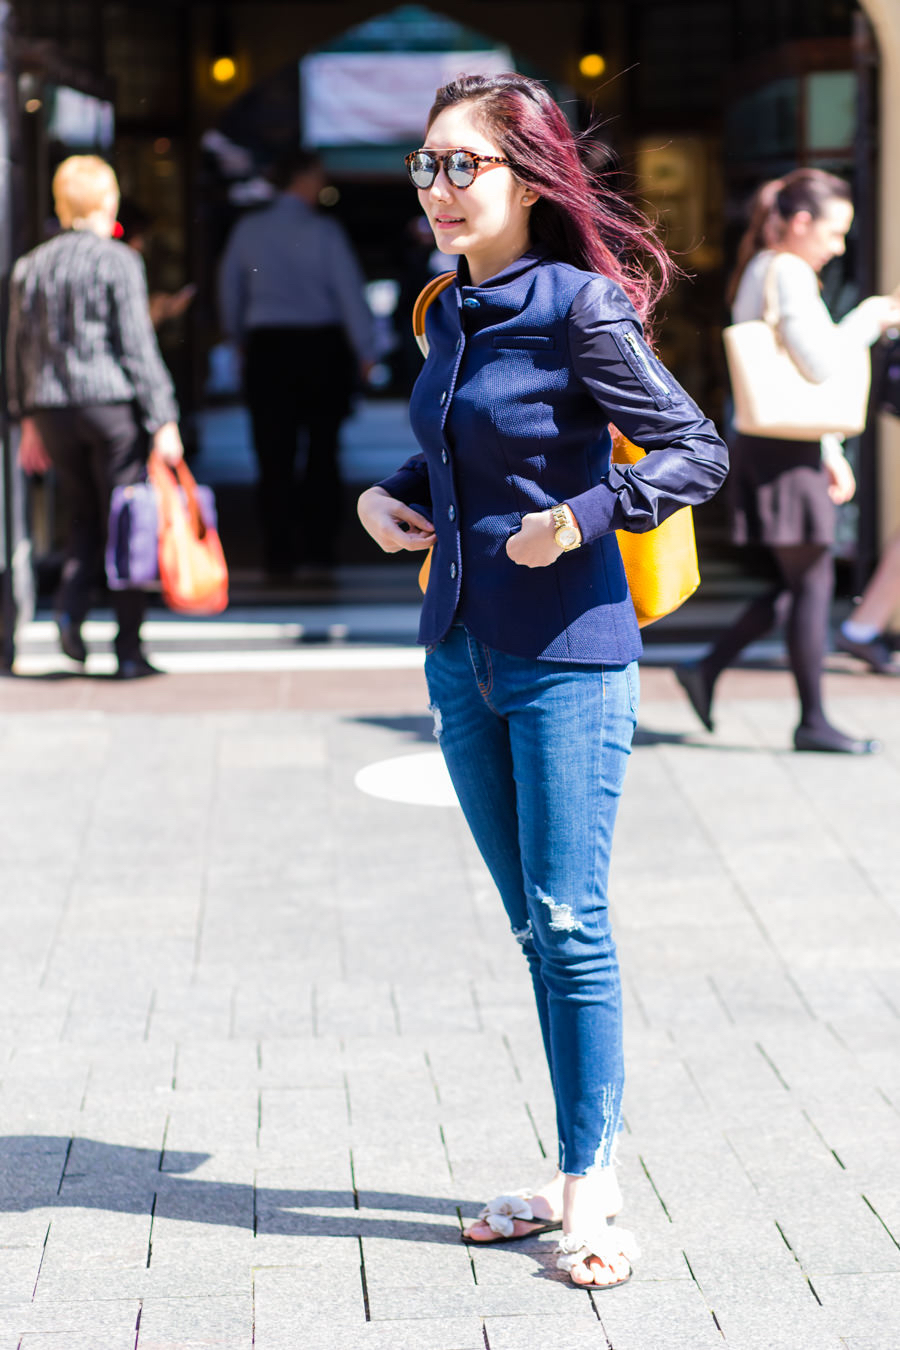 "WA: Adira Artika, Entrepreneur, Perth CBD. ""I like to dress up nice all the time."" Photo: <a href=""http://www.rahstudios.com.au/street-style.html/"" target=""_blank"">Alain Quah</a>"